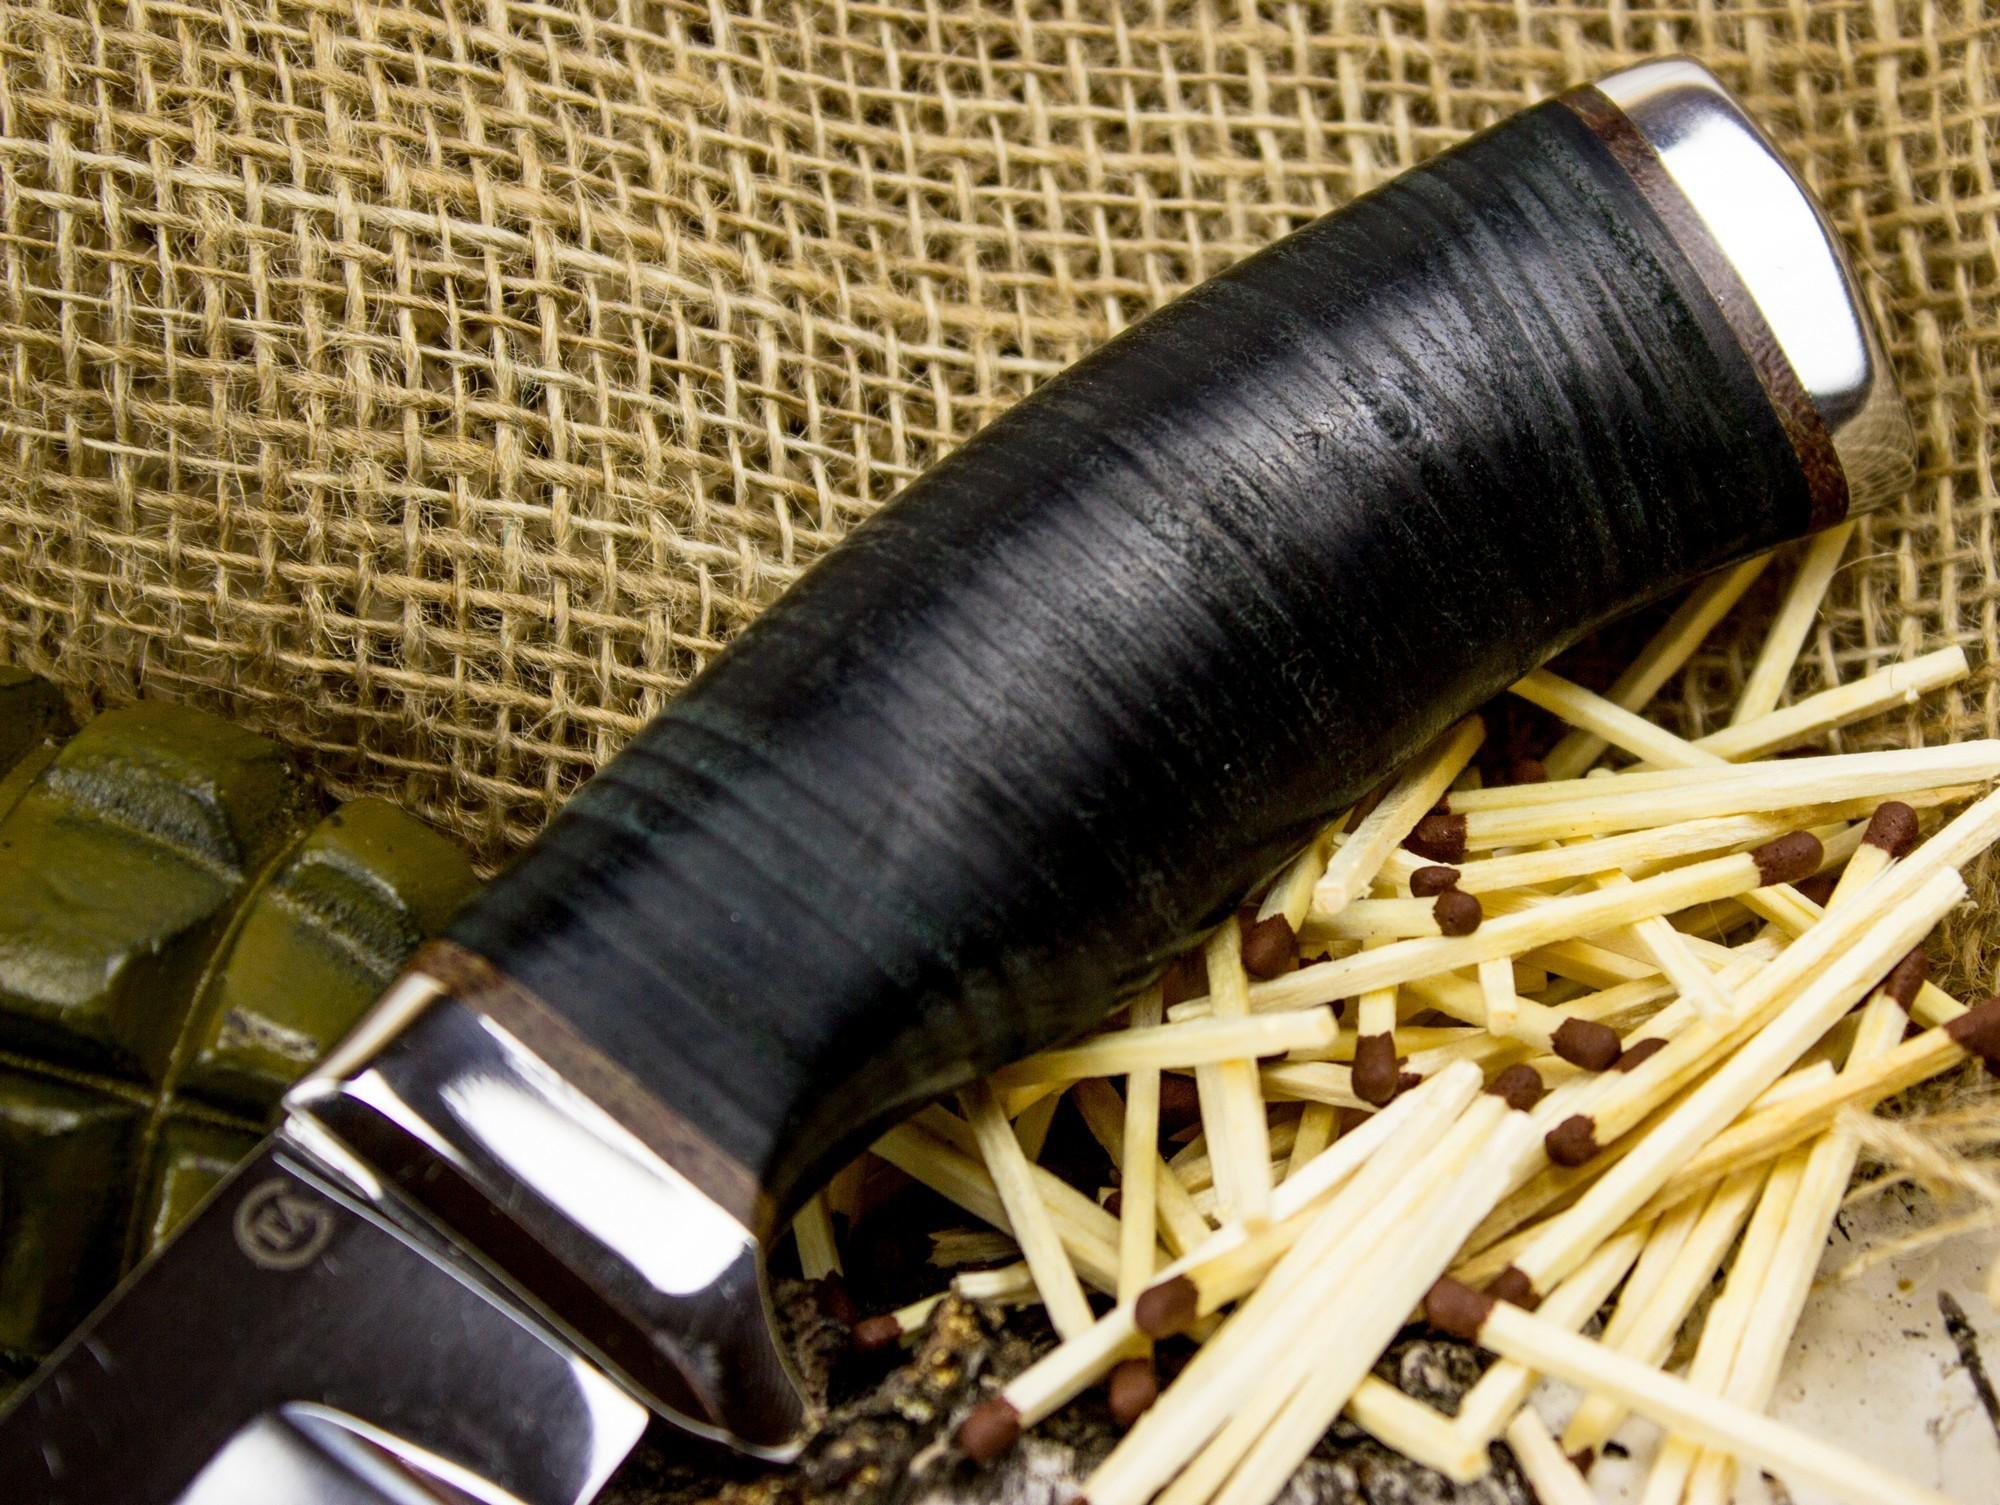 Фото 2 - Нож Кубанец, сталь 95х18, кожа от Титов и Солдатова